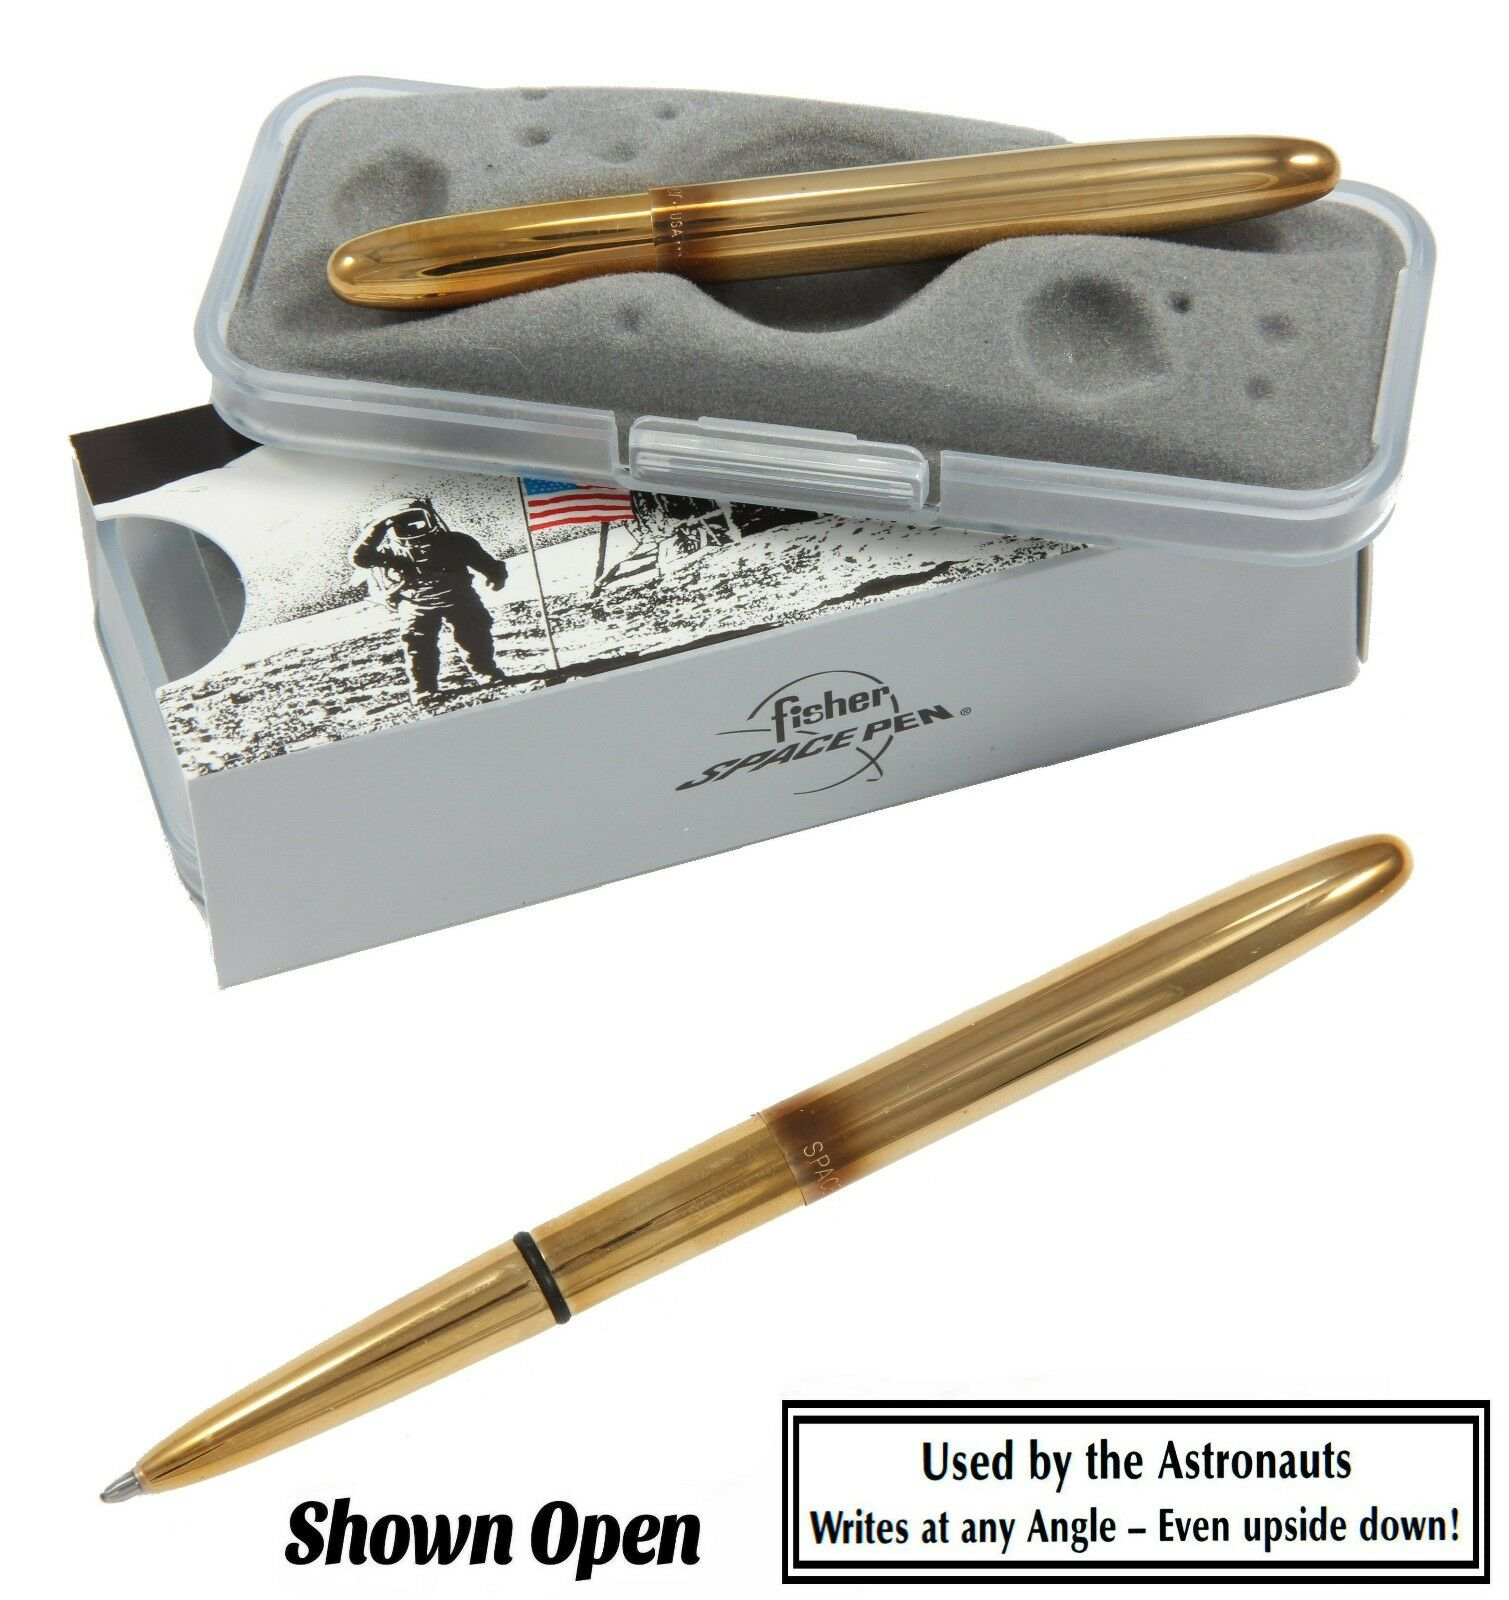 Fisher Space Pen 400-RAW Medium Point Raw Brass Bullet Pen Black Ink